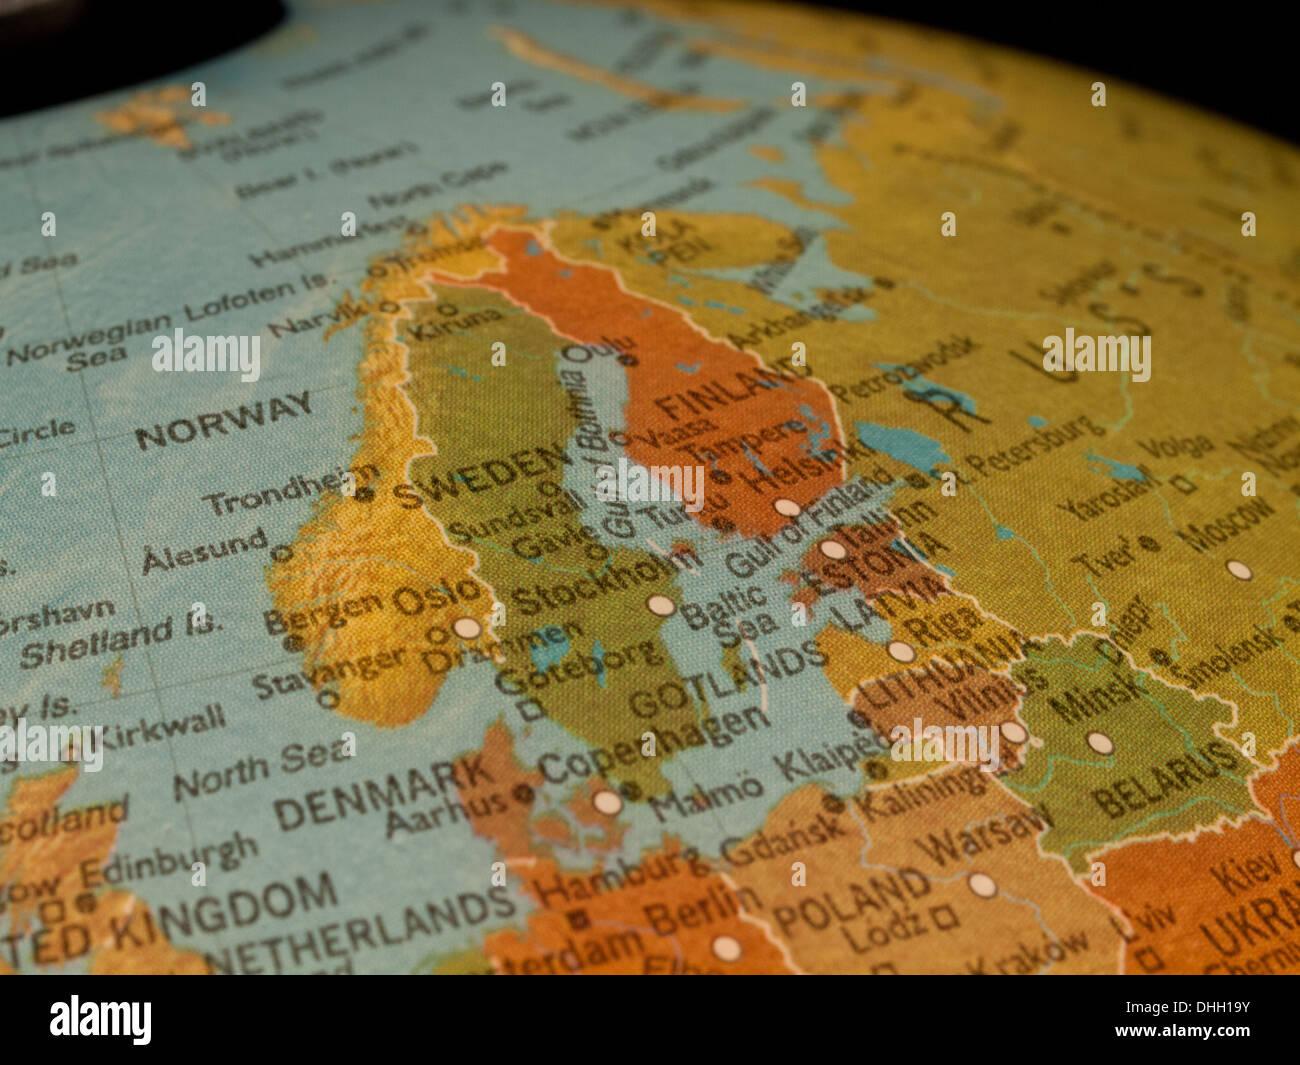 a view of scandinavia and northern europe on a beautiful illuminated globe